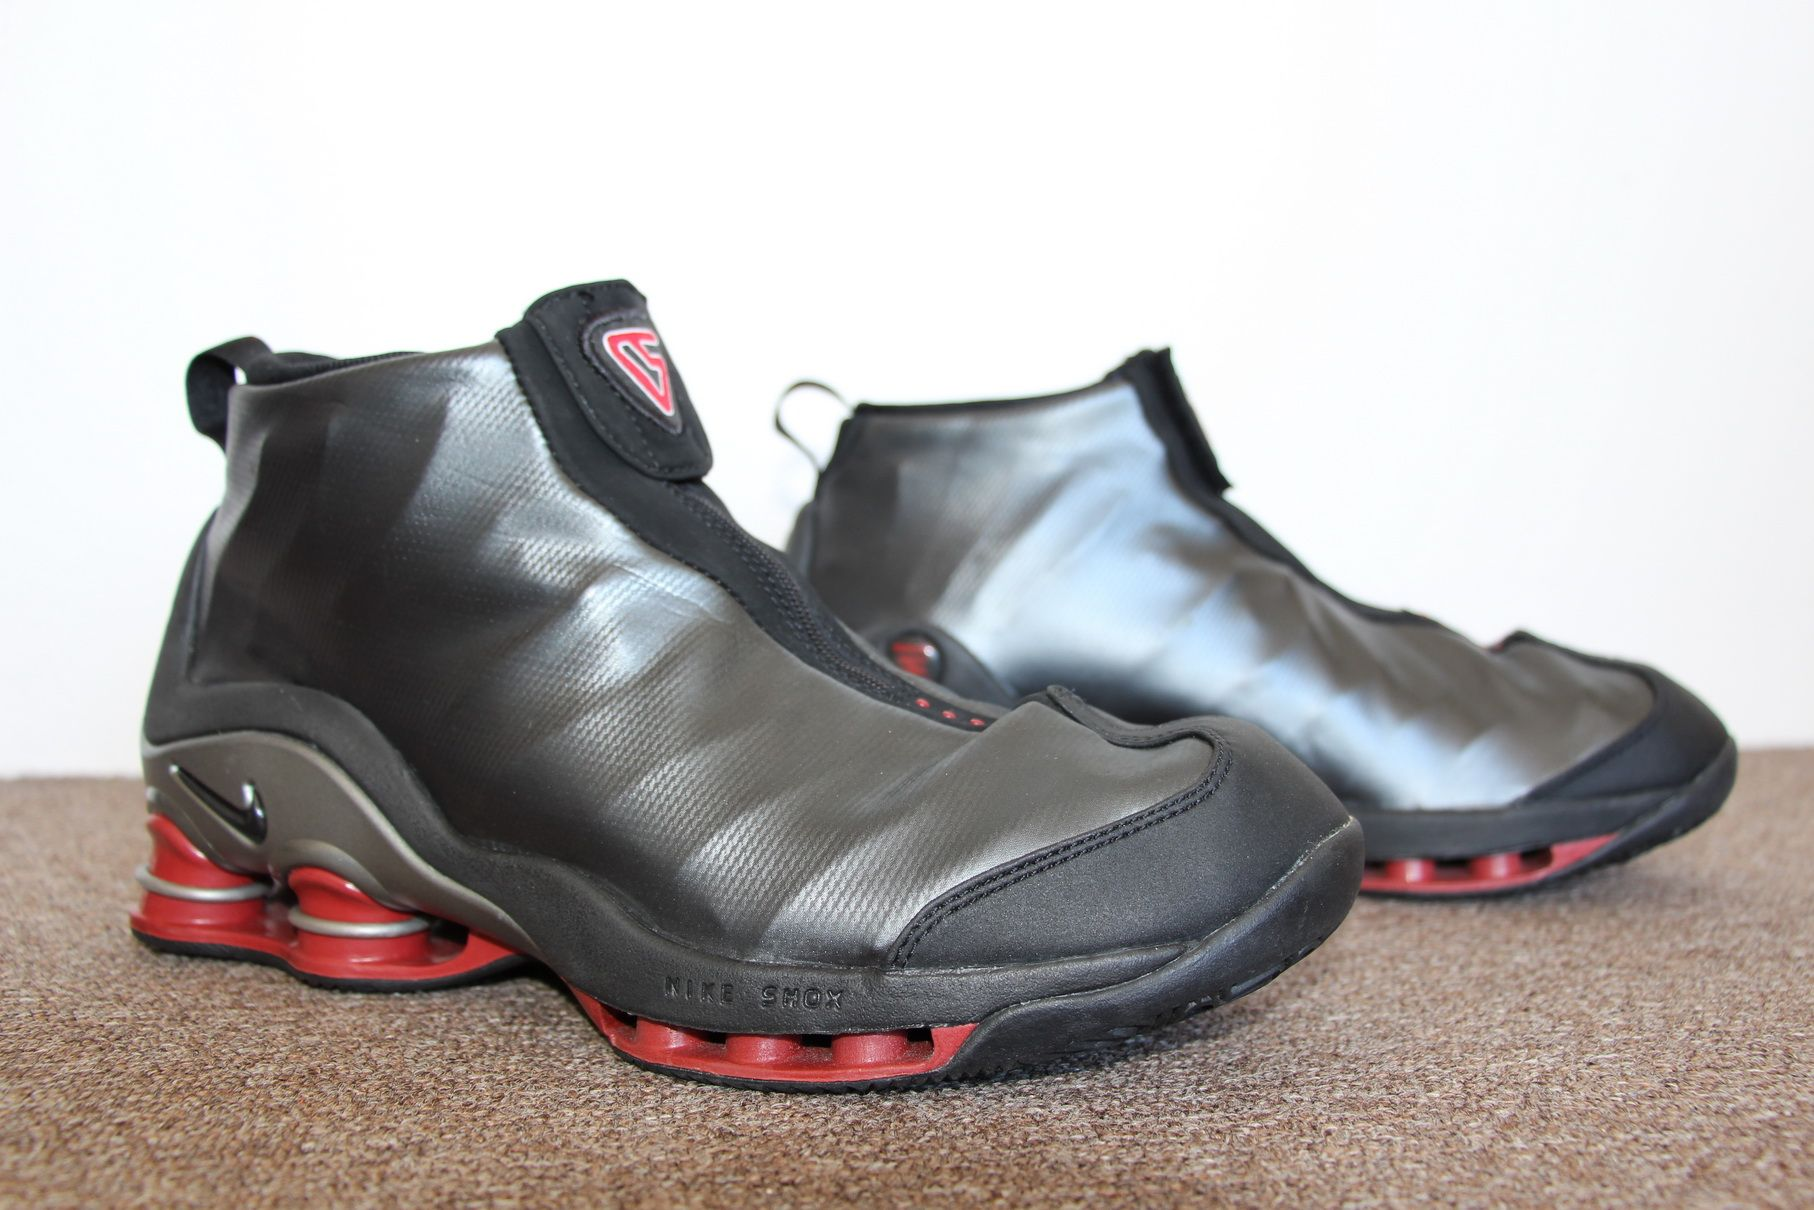 Nike Shox Vince Carter 2001 (Black/Varsity Red \u2013 Metallic-Silver)